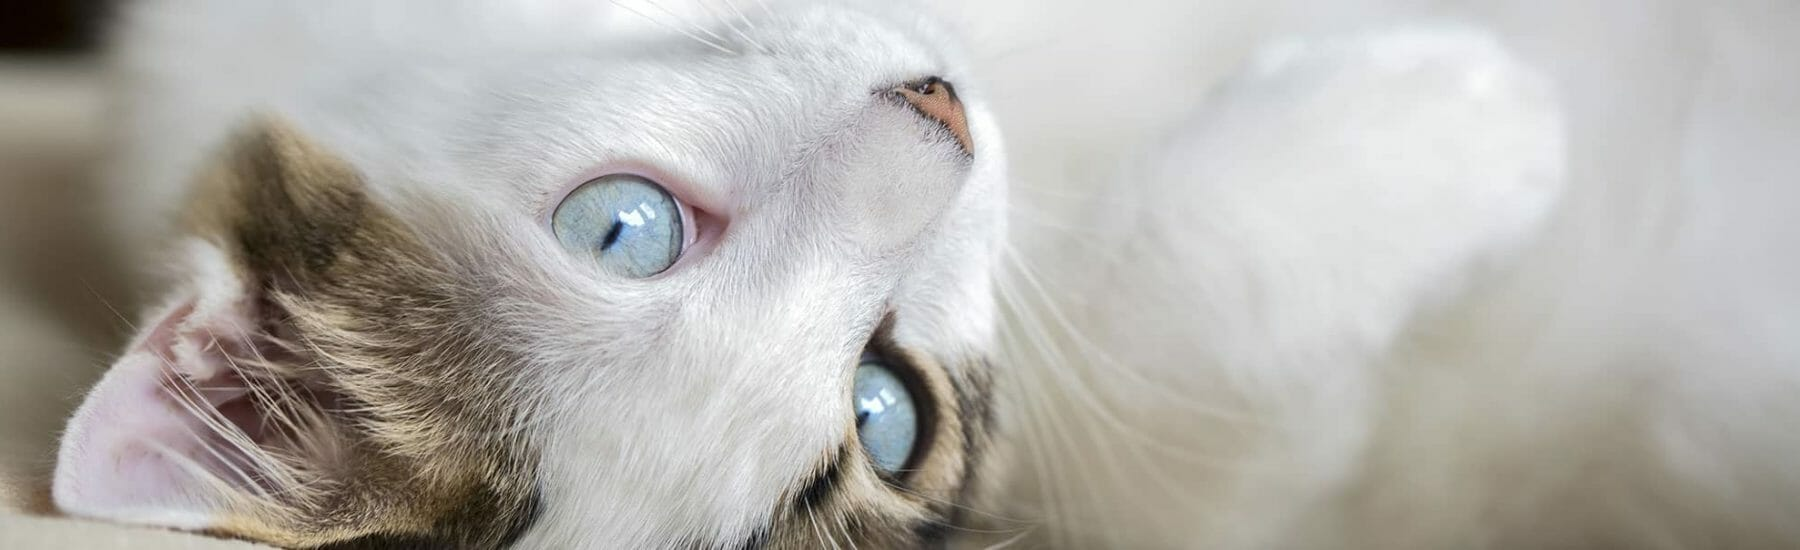 White cat lying on its back